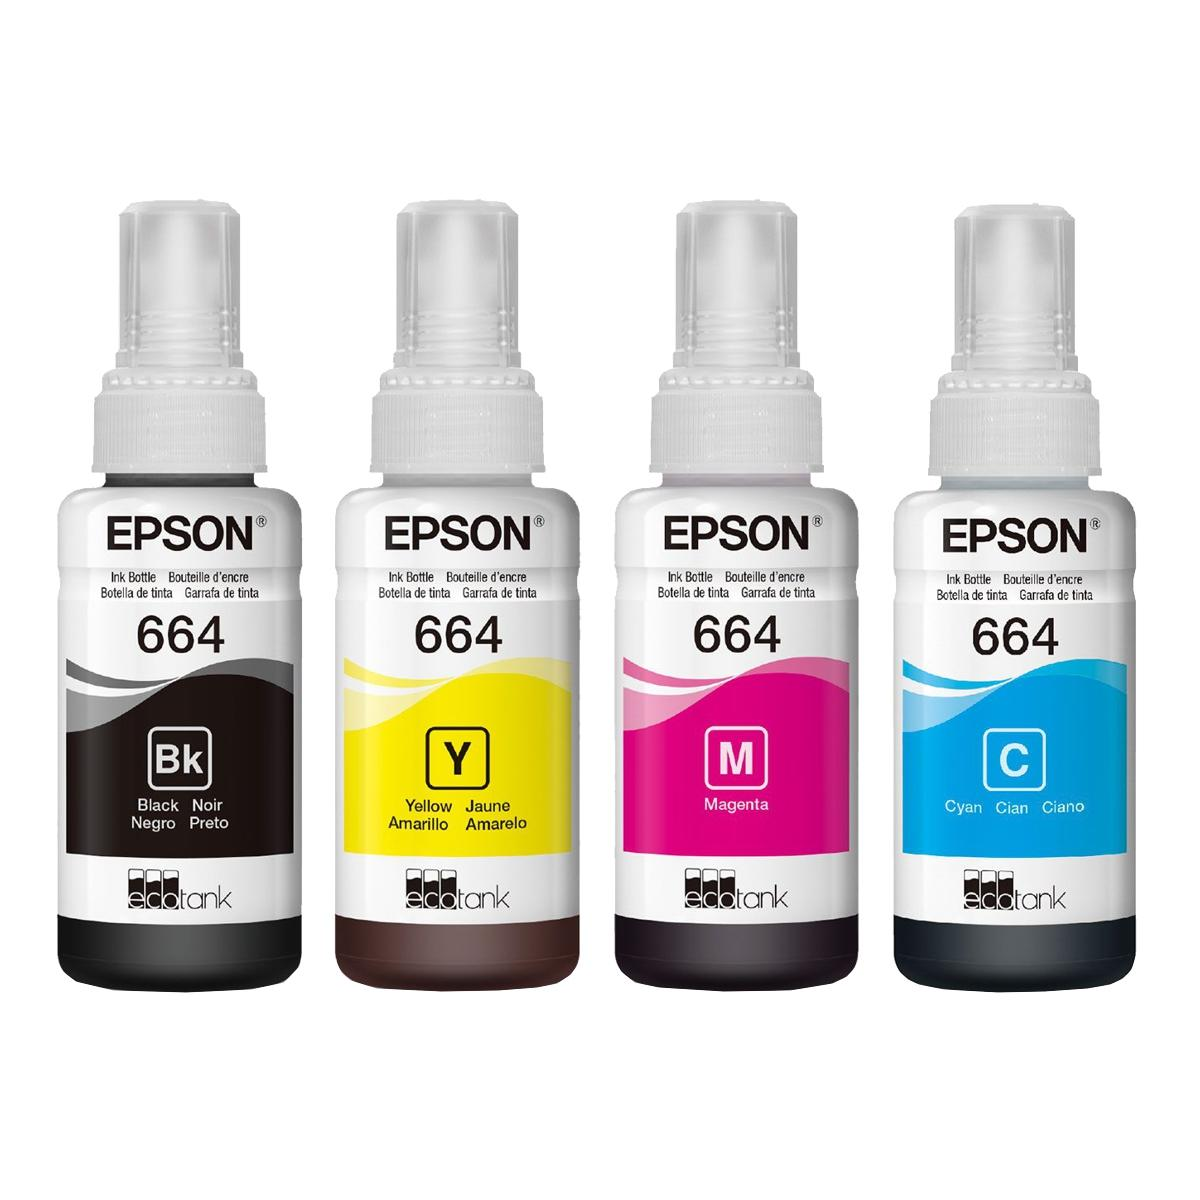 Kit Refil de Tinta Original Epson 4 Cores 664 70ml - L110 L120 L200 L210 L220 L355 L365 L375 L380 L395 L396 L455 L495 L555 e Similares